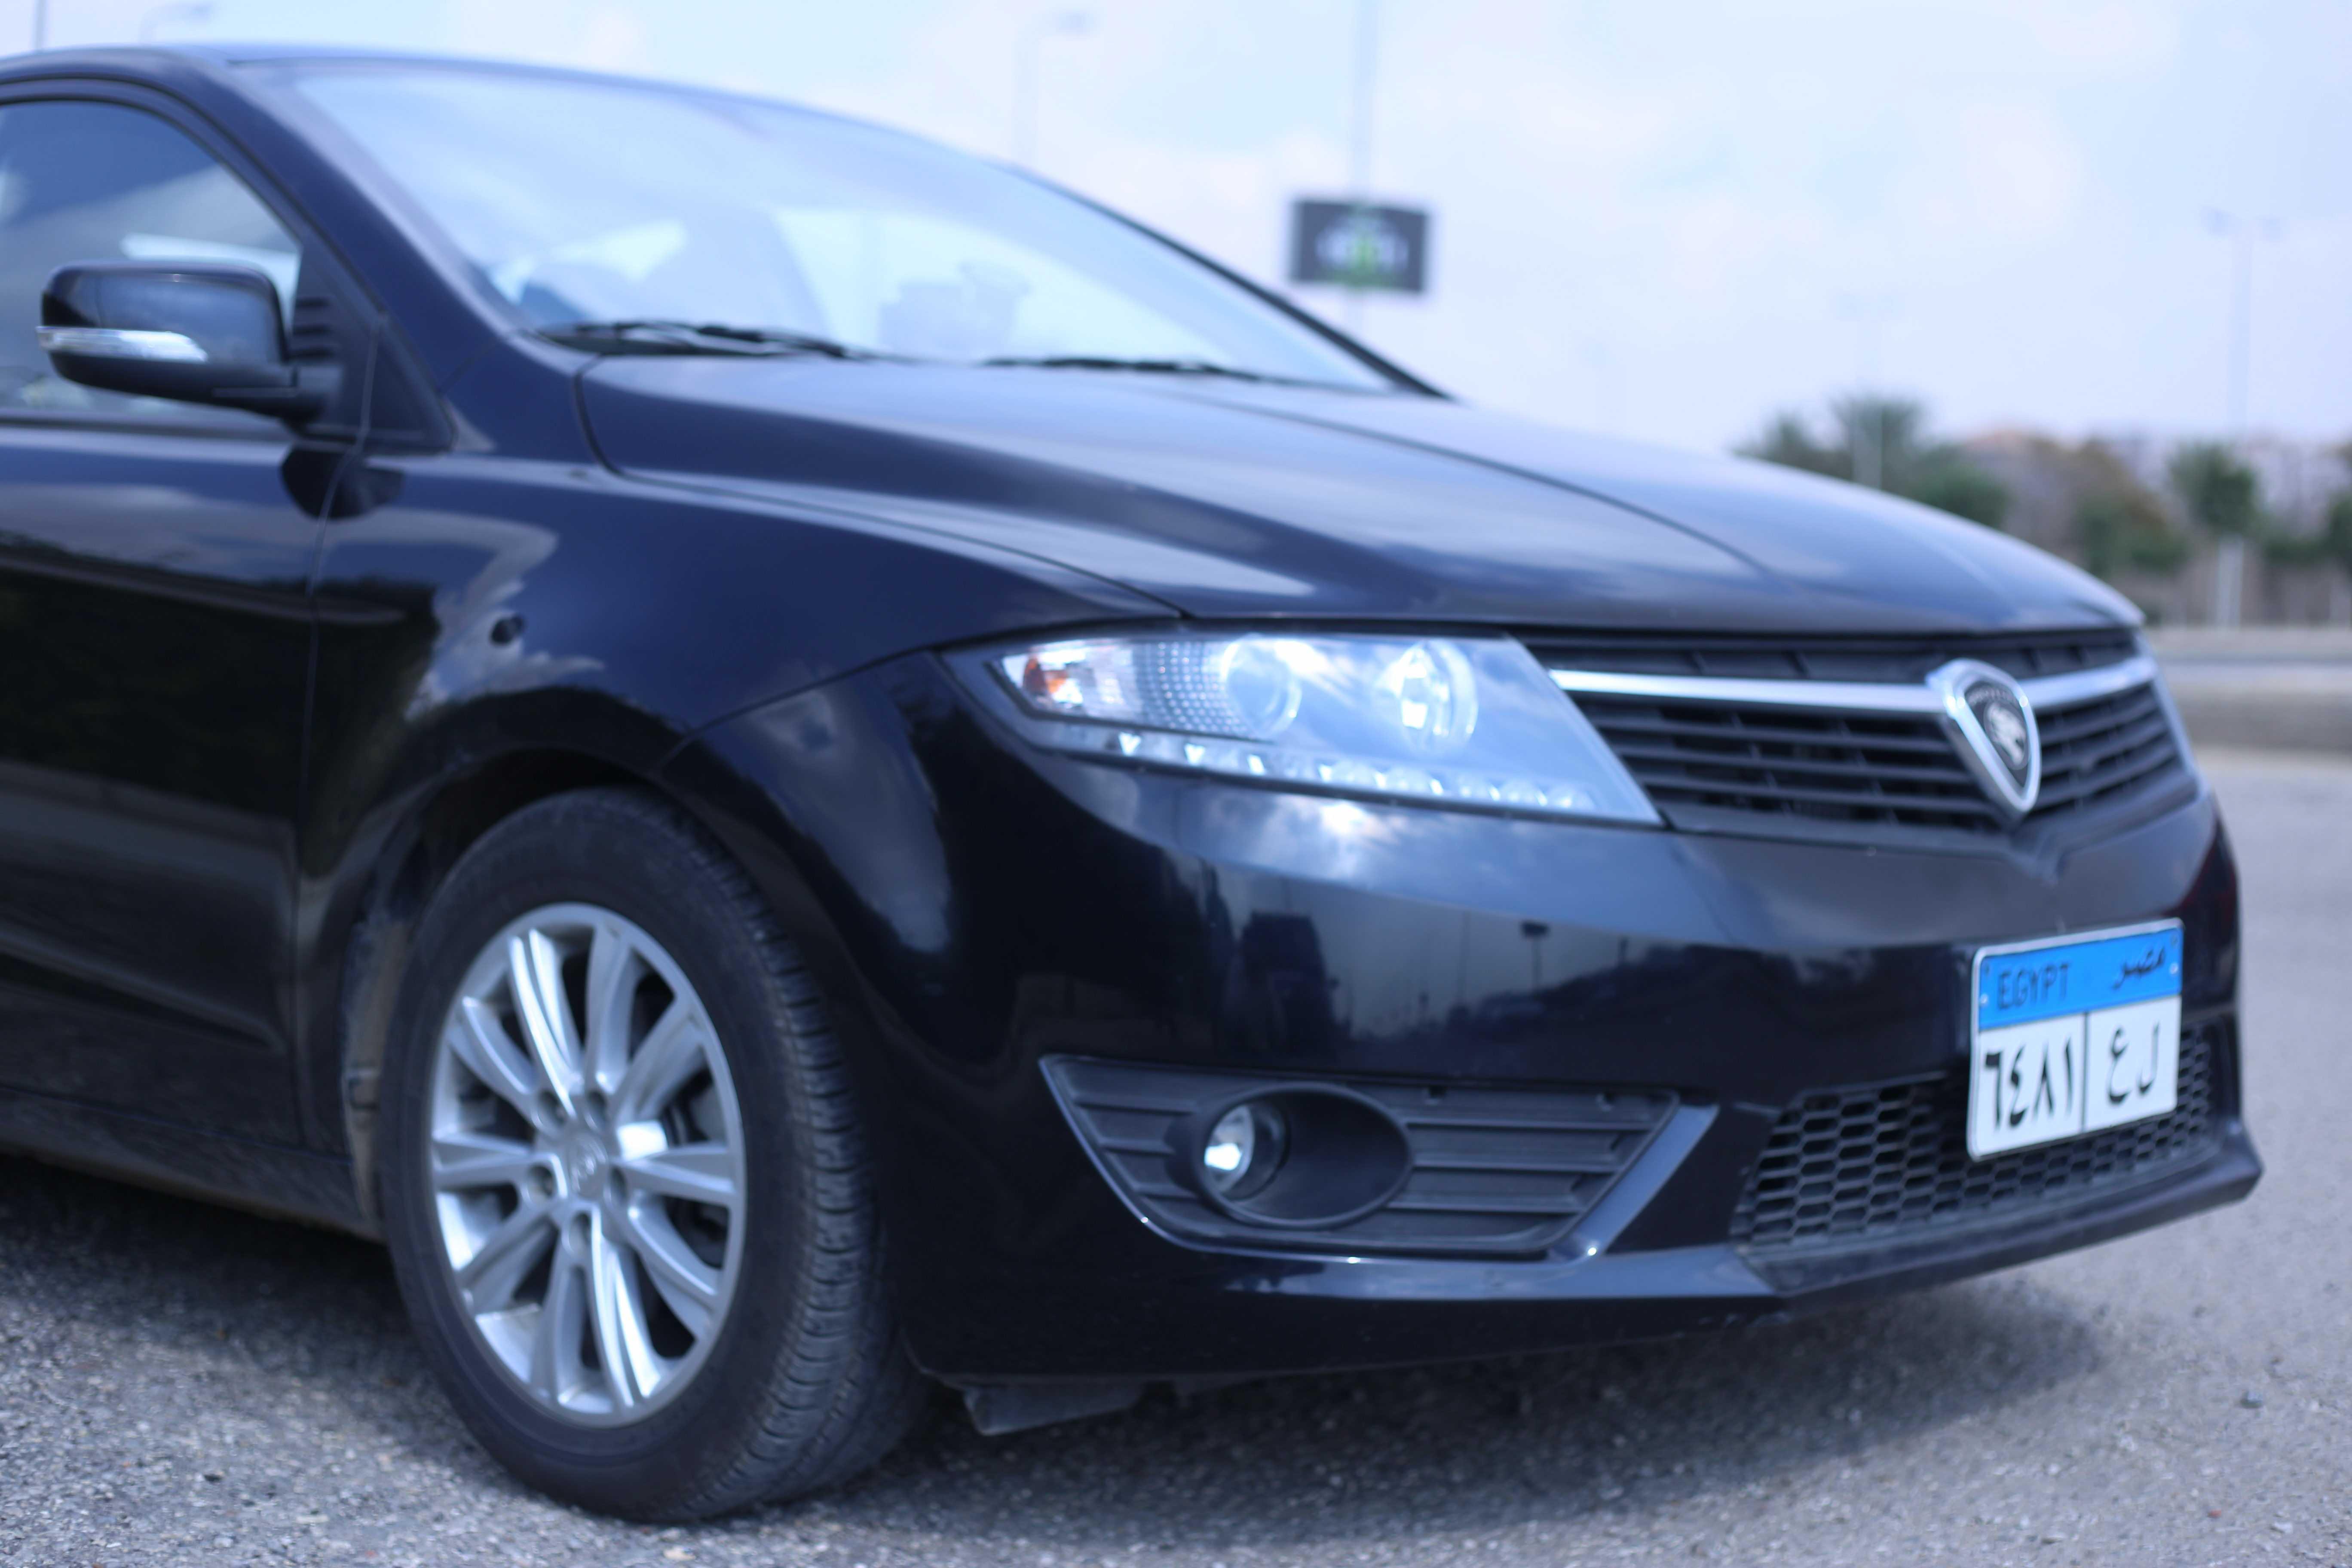 Volkswagen : Daily News Egypt test drives Proton Prevé